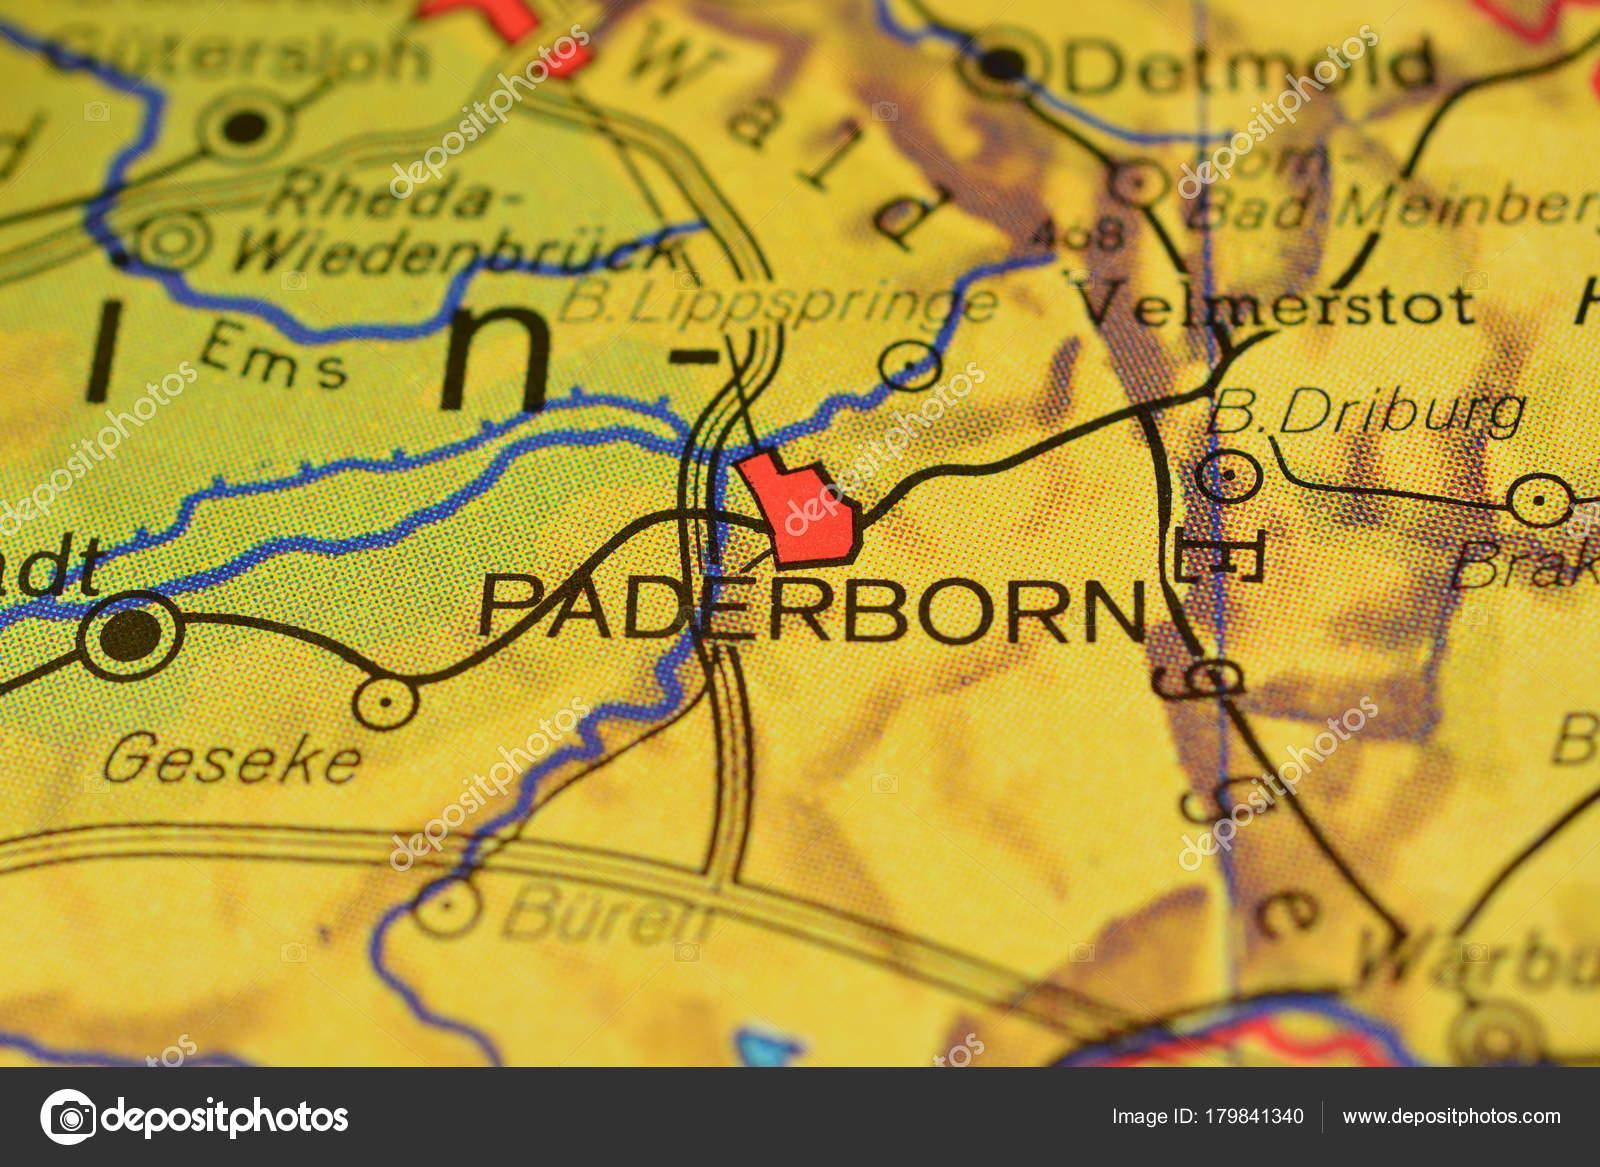 Karte Paderborn.Stadt Paderborn Name Der Karte Stockfoto Photographer 20 179841340